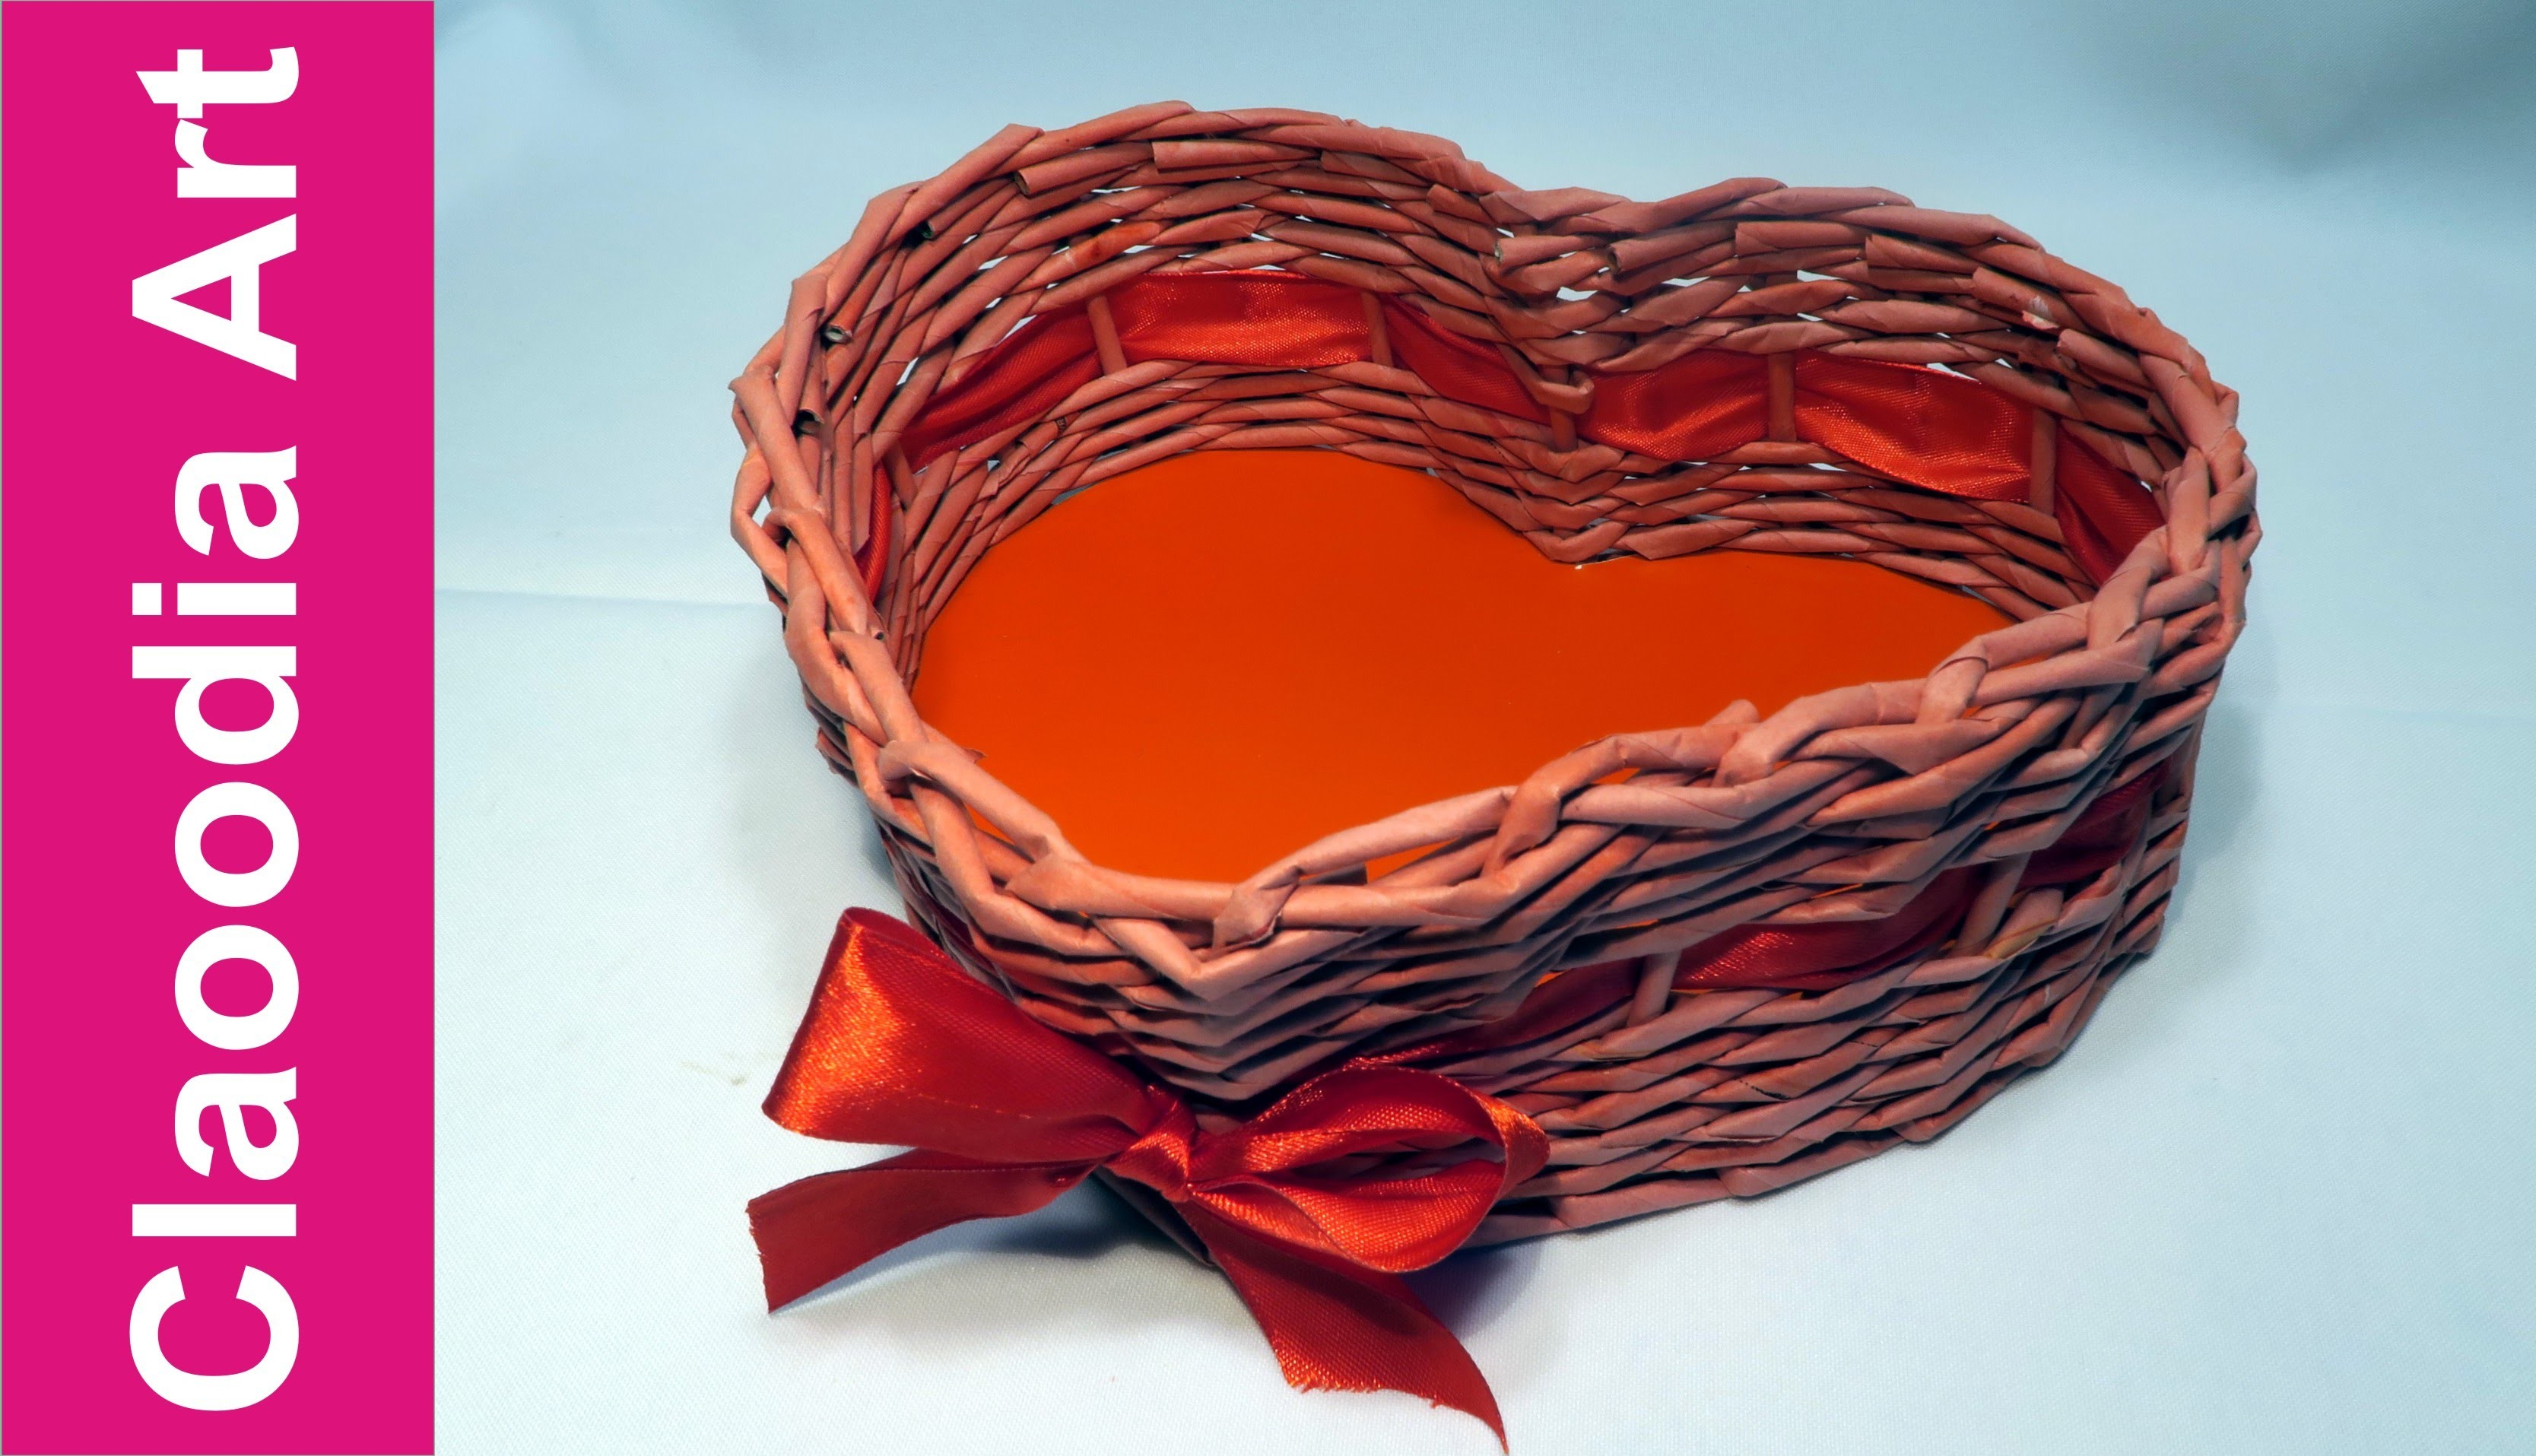 Koszyk SERCE, papierowa wiklina (basket heart, wicker paper)